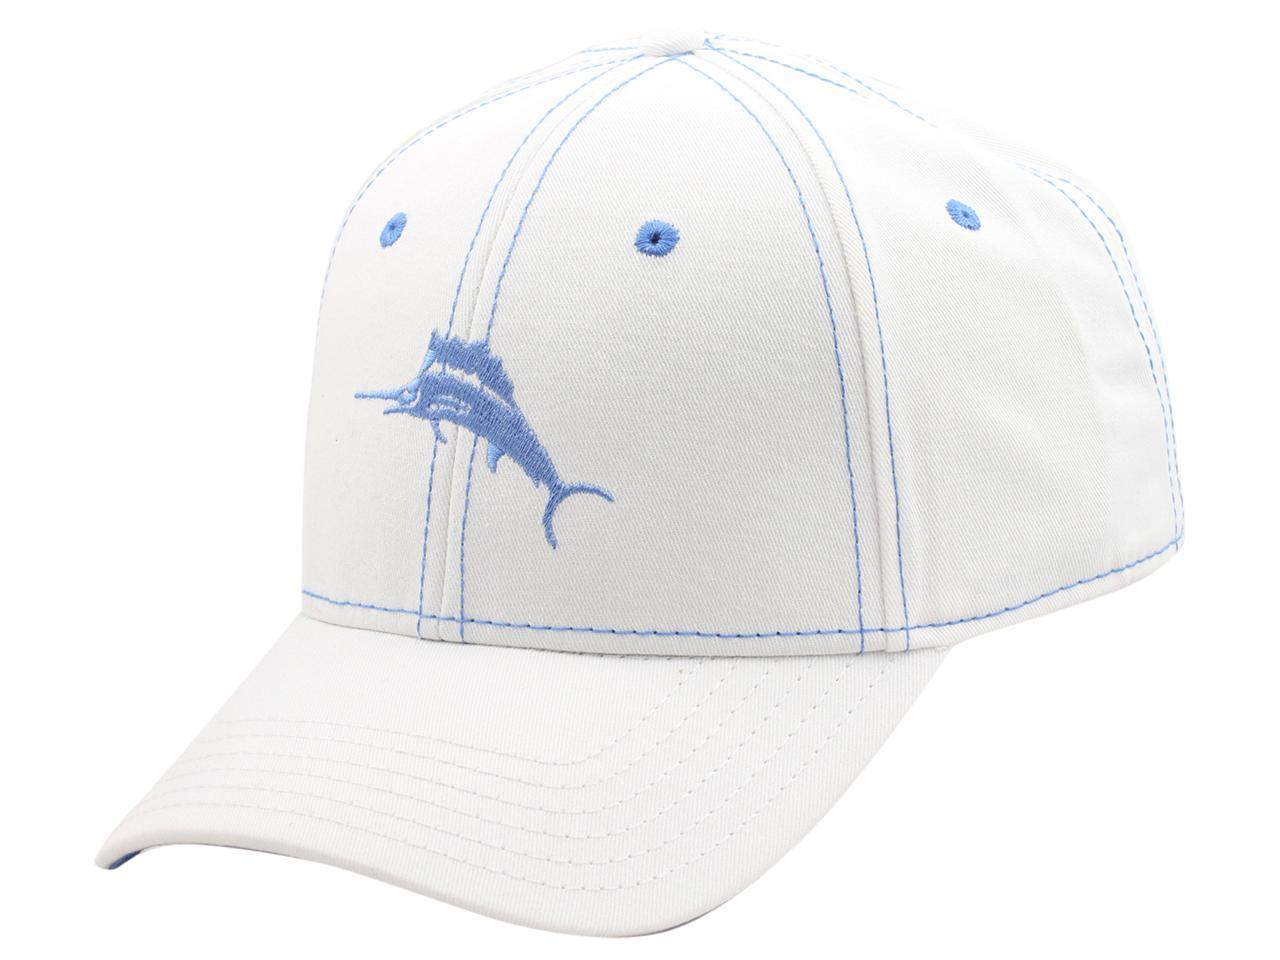 Image of Tommy Bahama Men's Strapback Baseball Cap Hat - White - One Size Fits Most